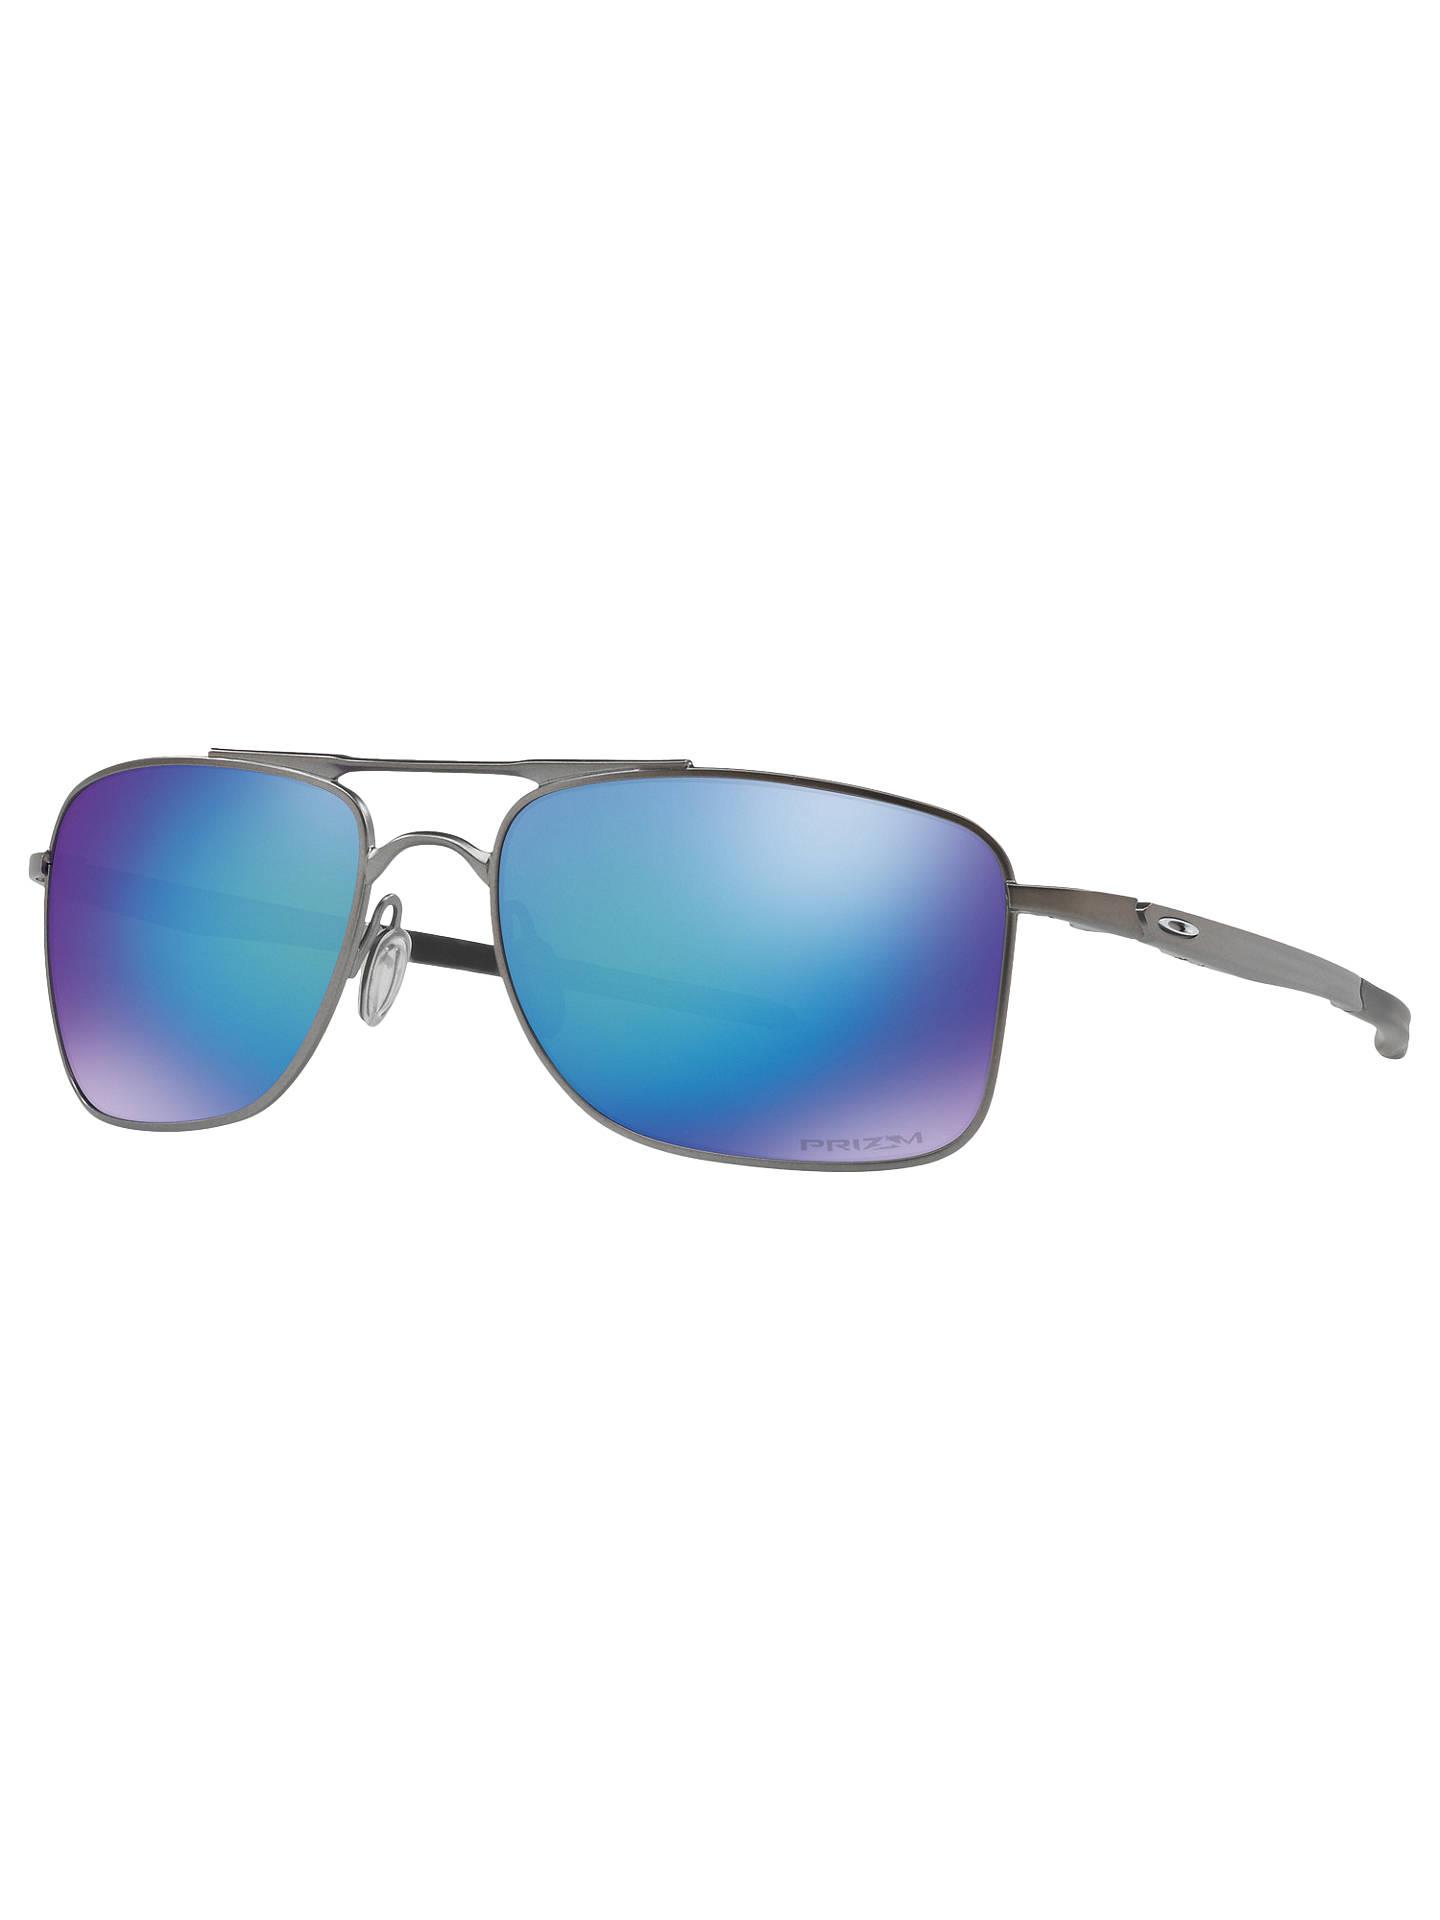 3591601eb6d55 Oakley OO4124 Gauge Prizm Polarised Rectangular Sunglasses at John ...